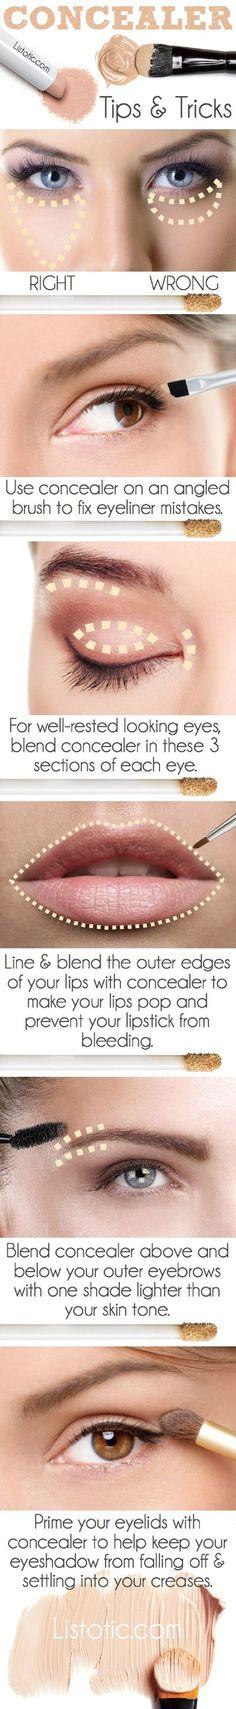 #Beauté #Erreurs #maquillage #Makeup